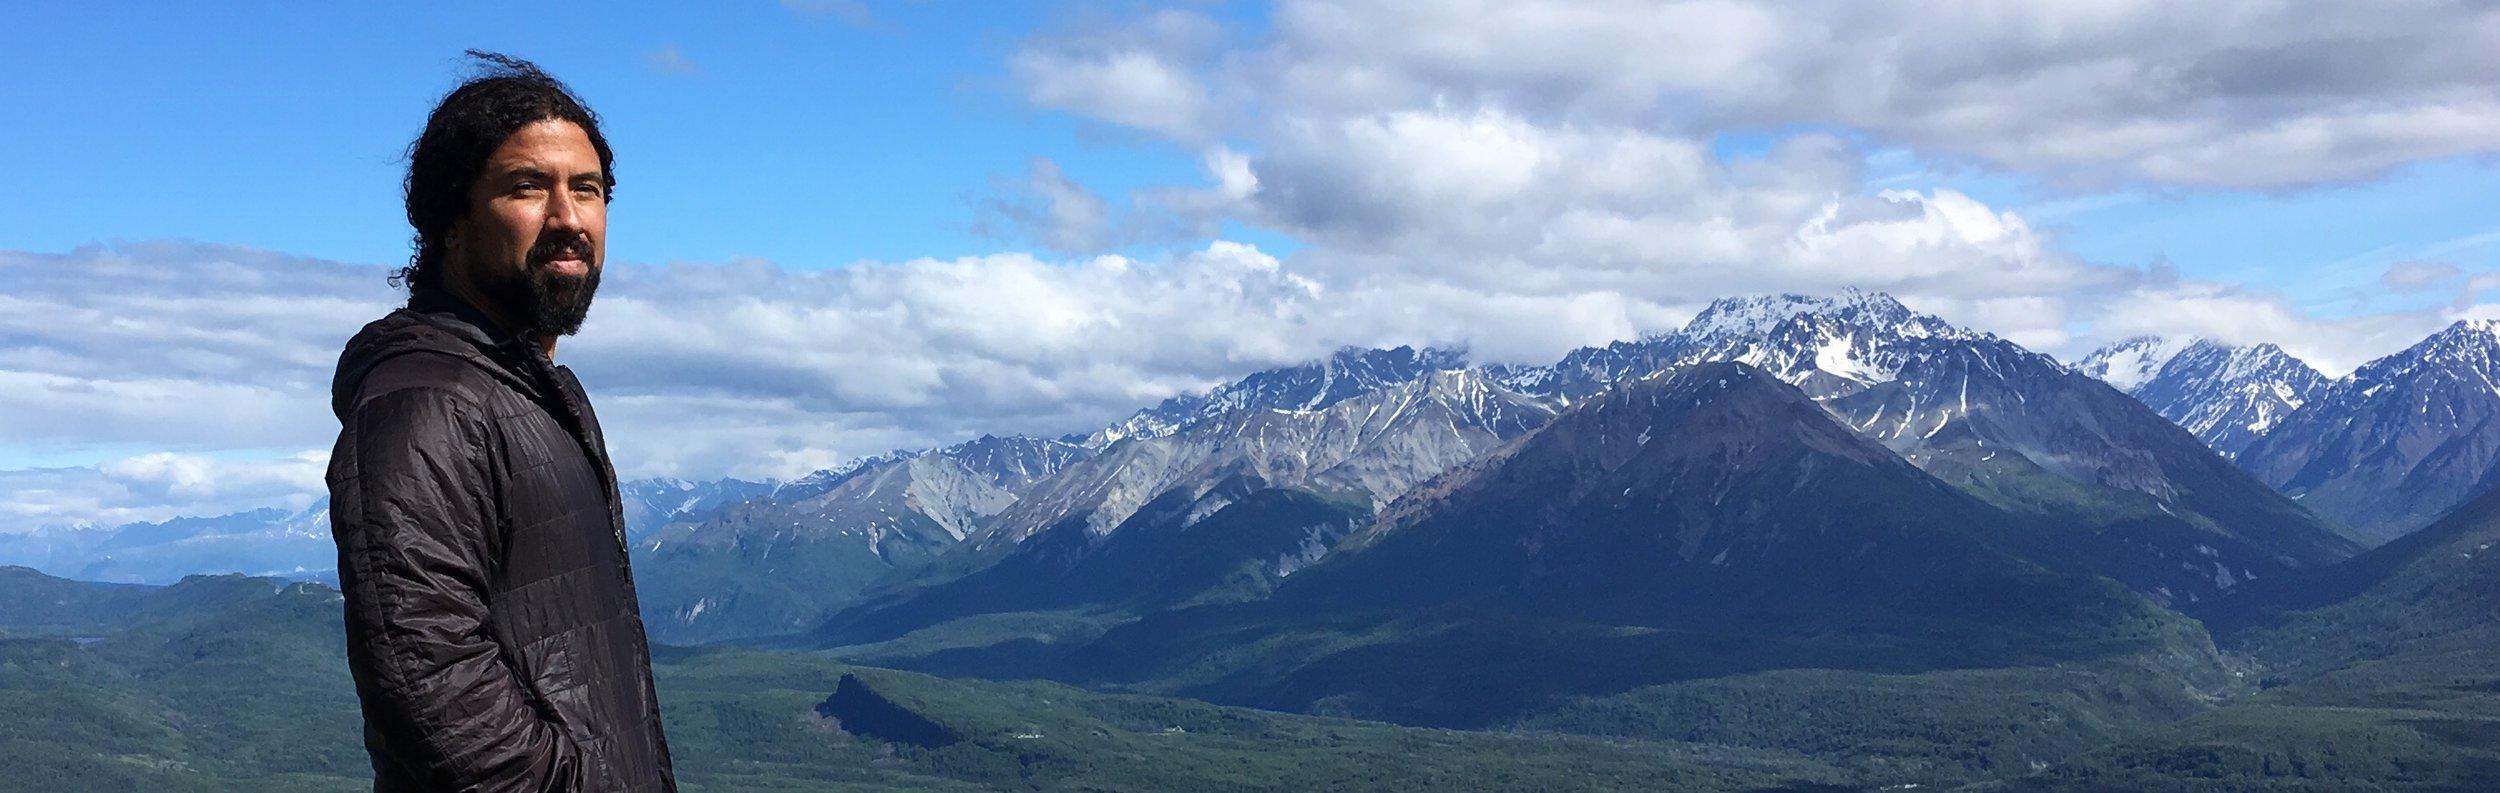 Rene_Mountain.jpg